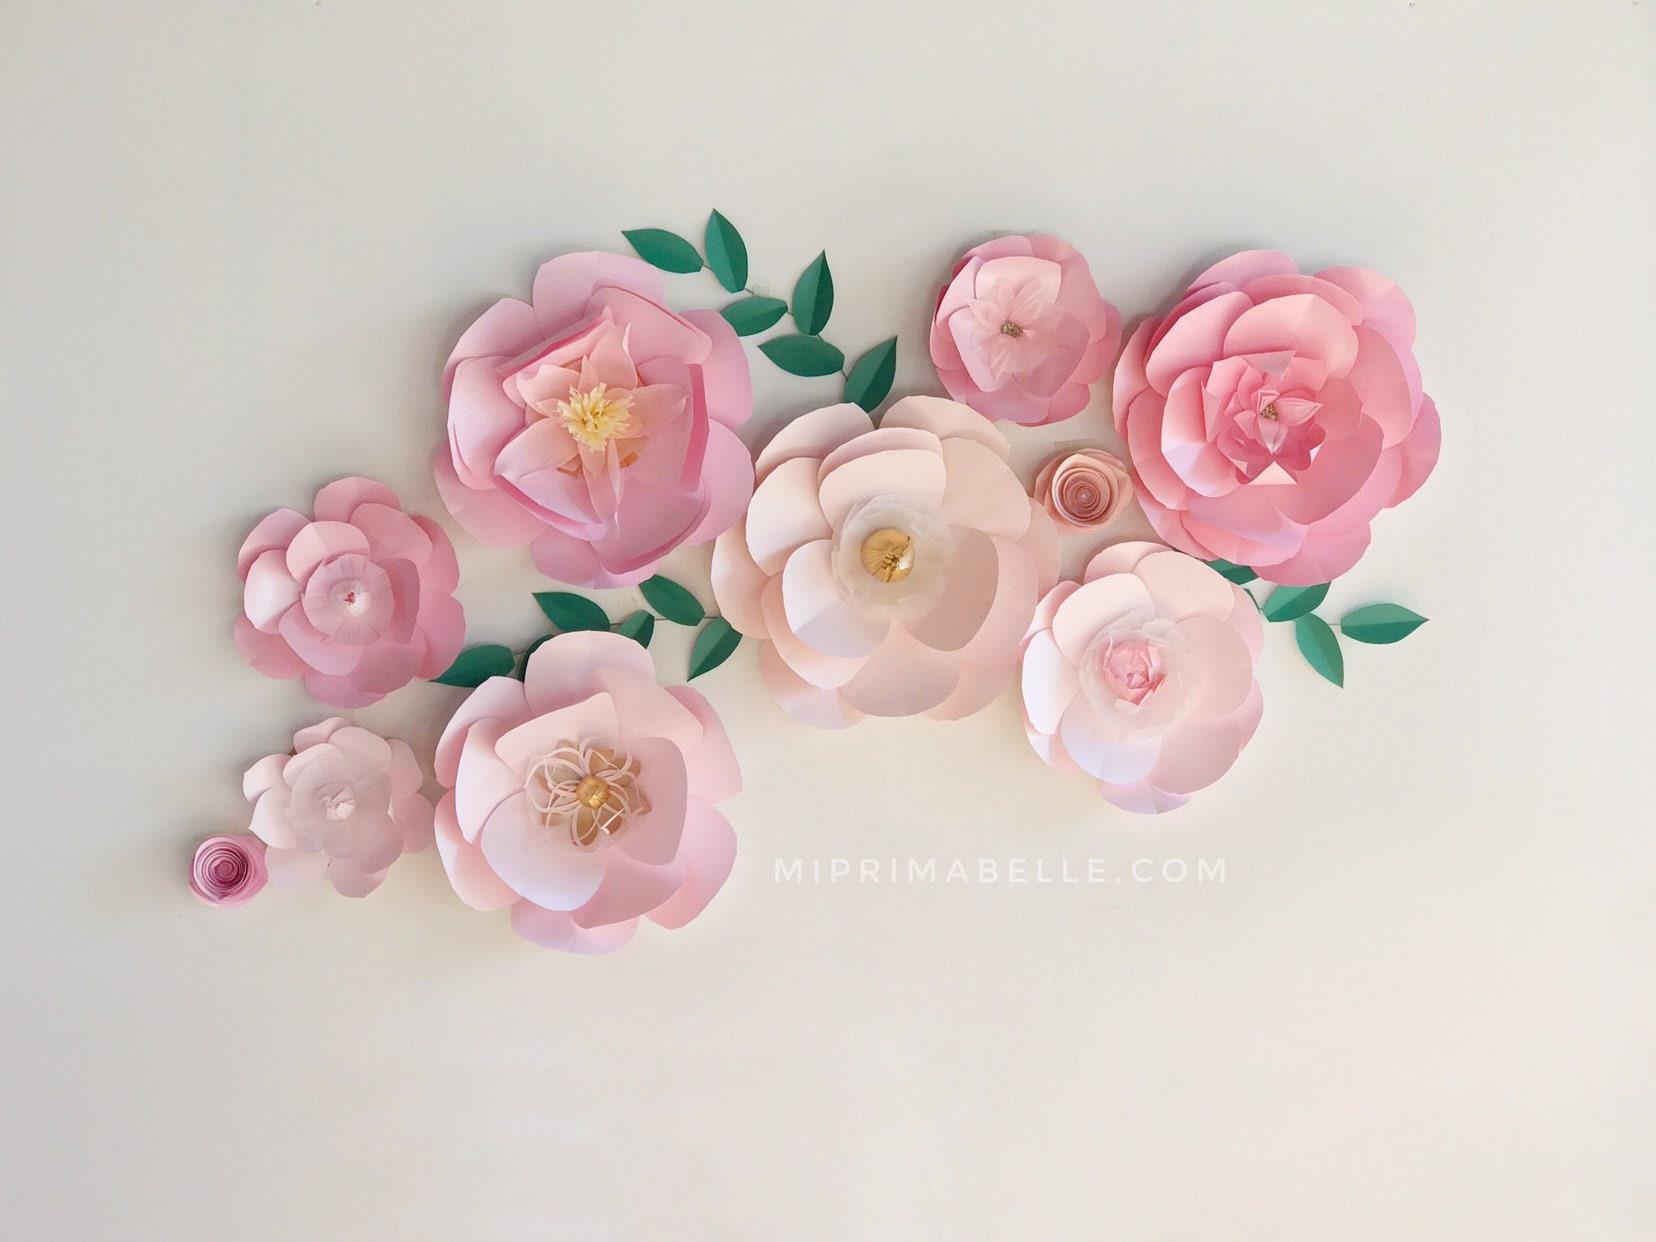 Paper Flowers Backdrop Large Pink Flowers Decor